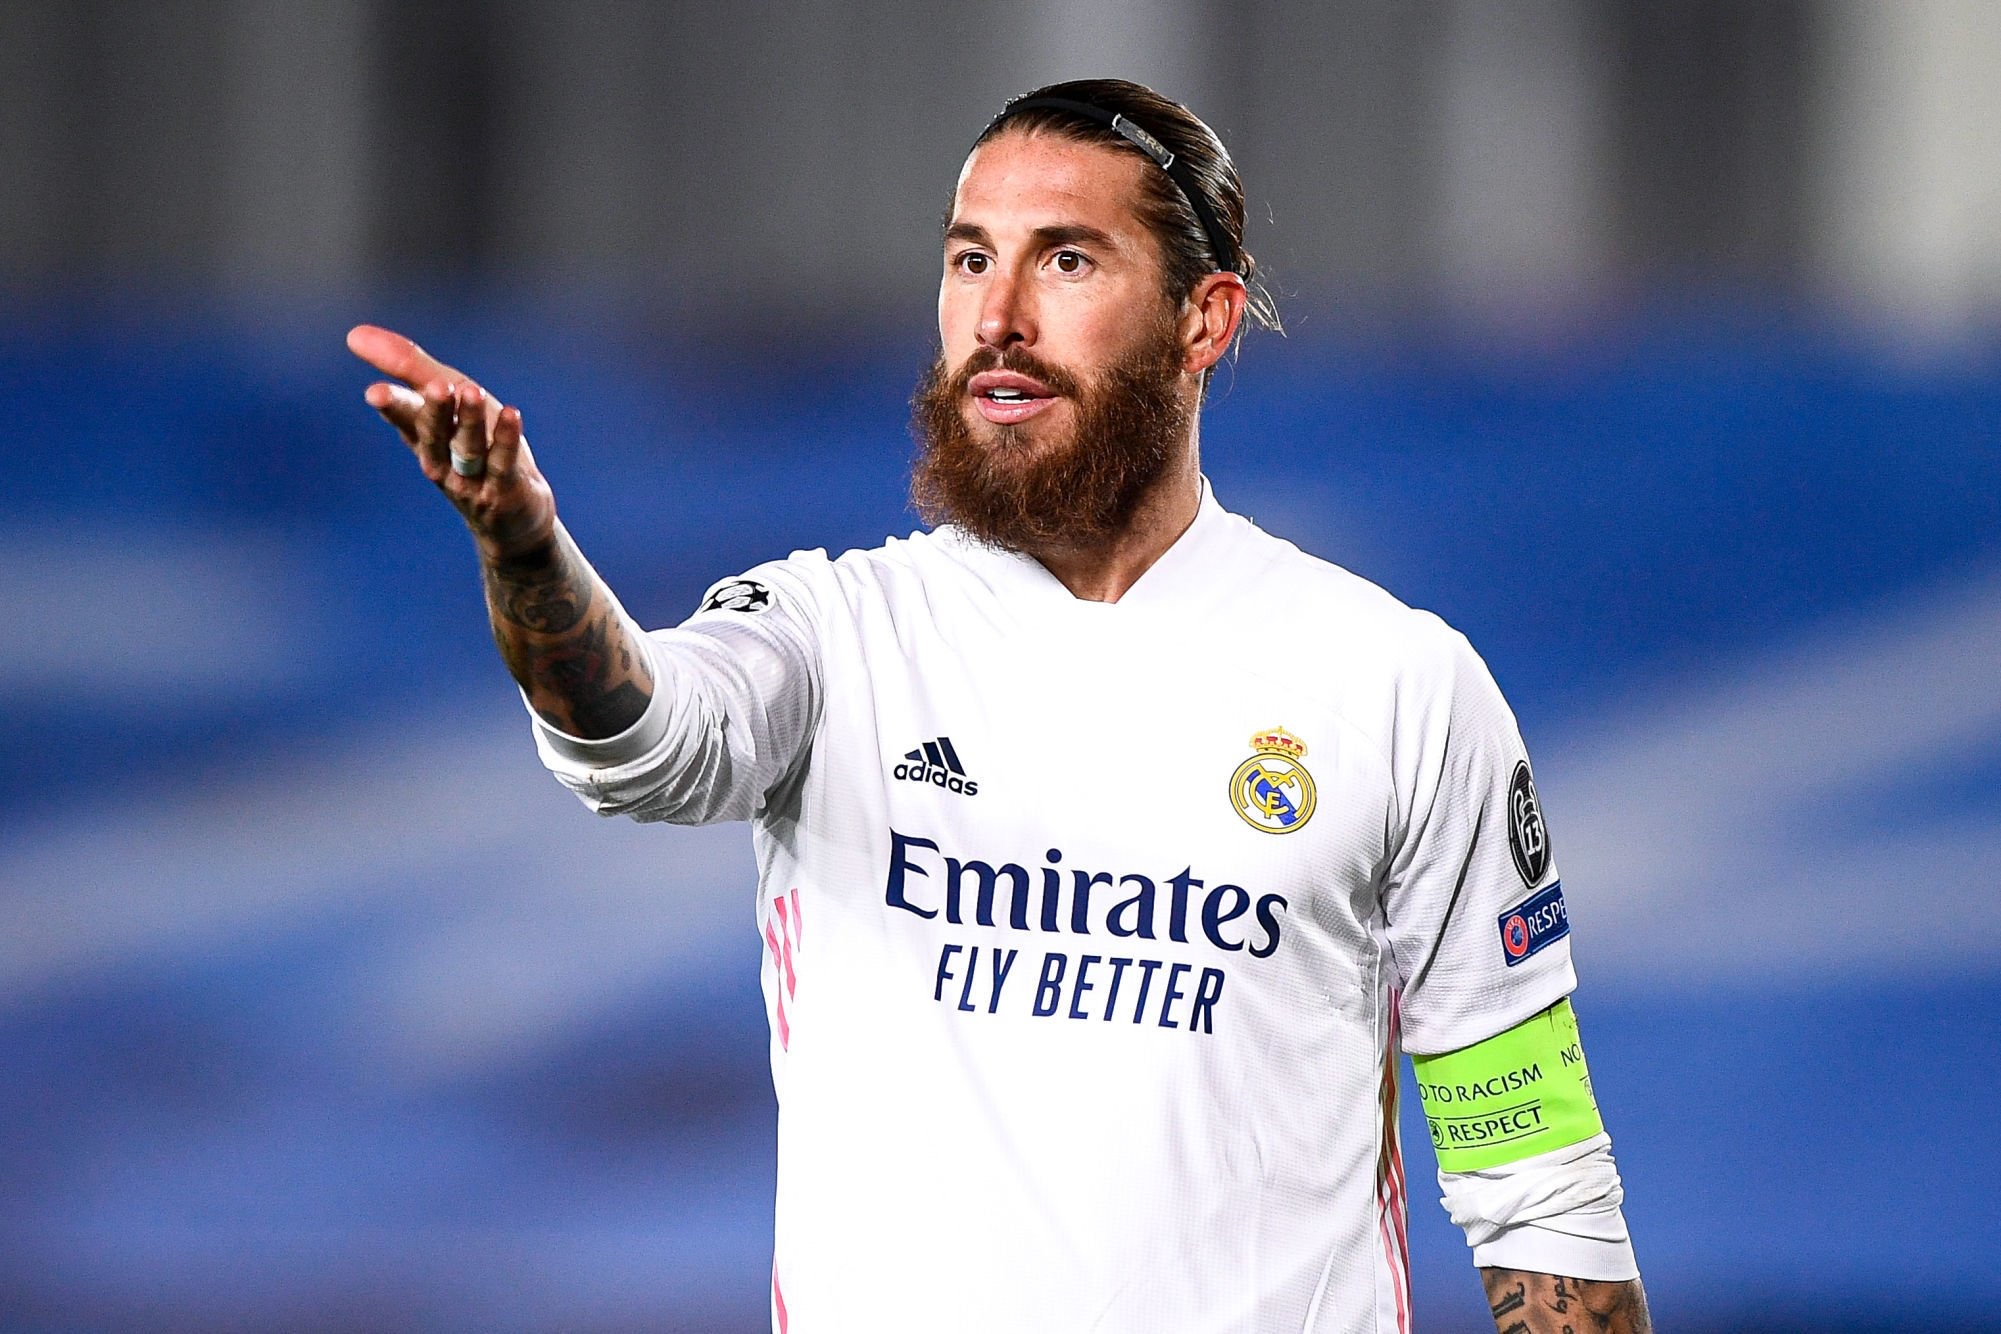 Real Madrid : Sergio Ramos absent pour plusieurs semaines suite à une blessure au genou.